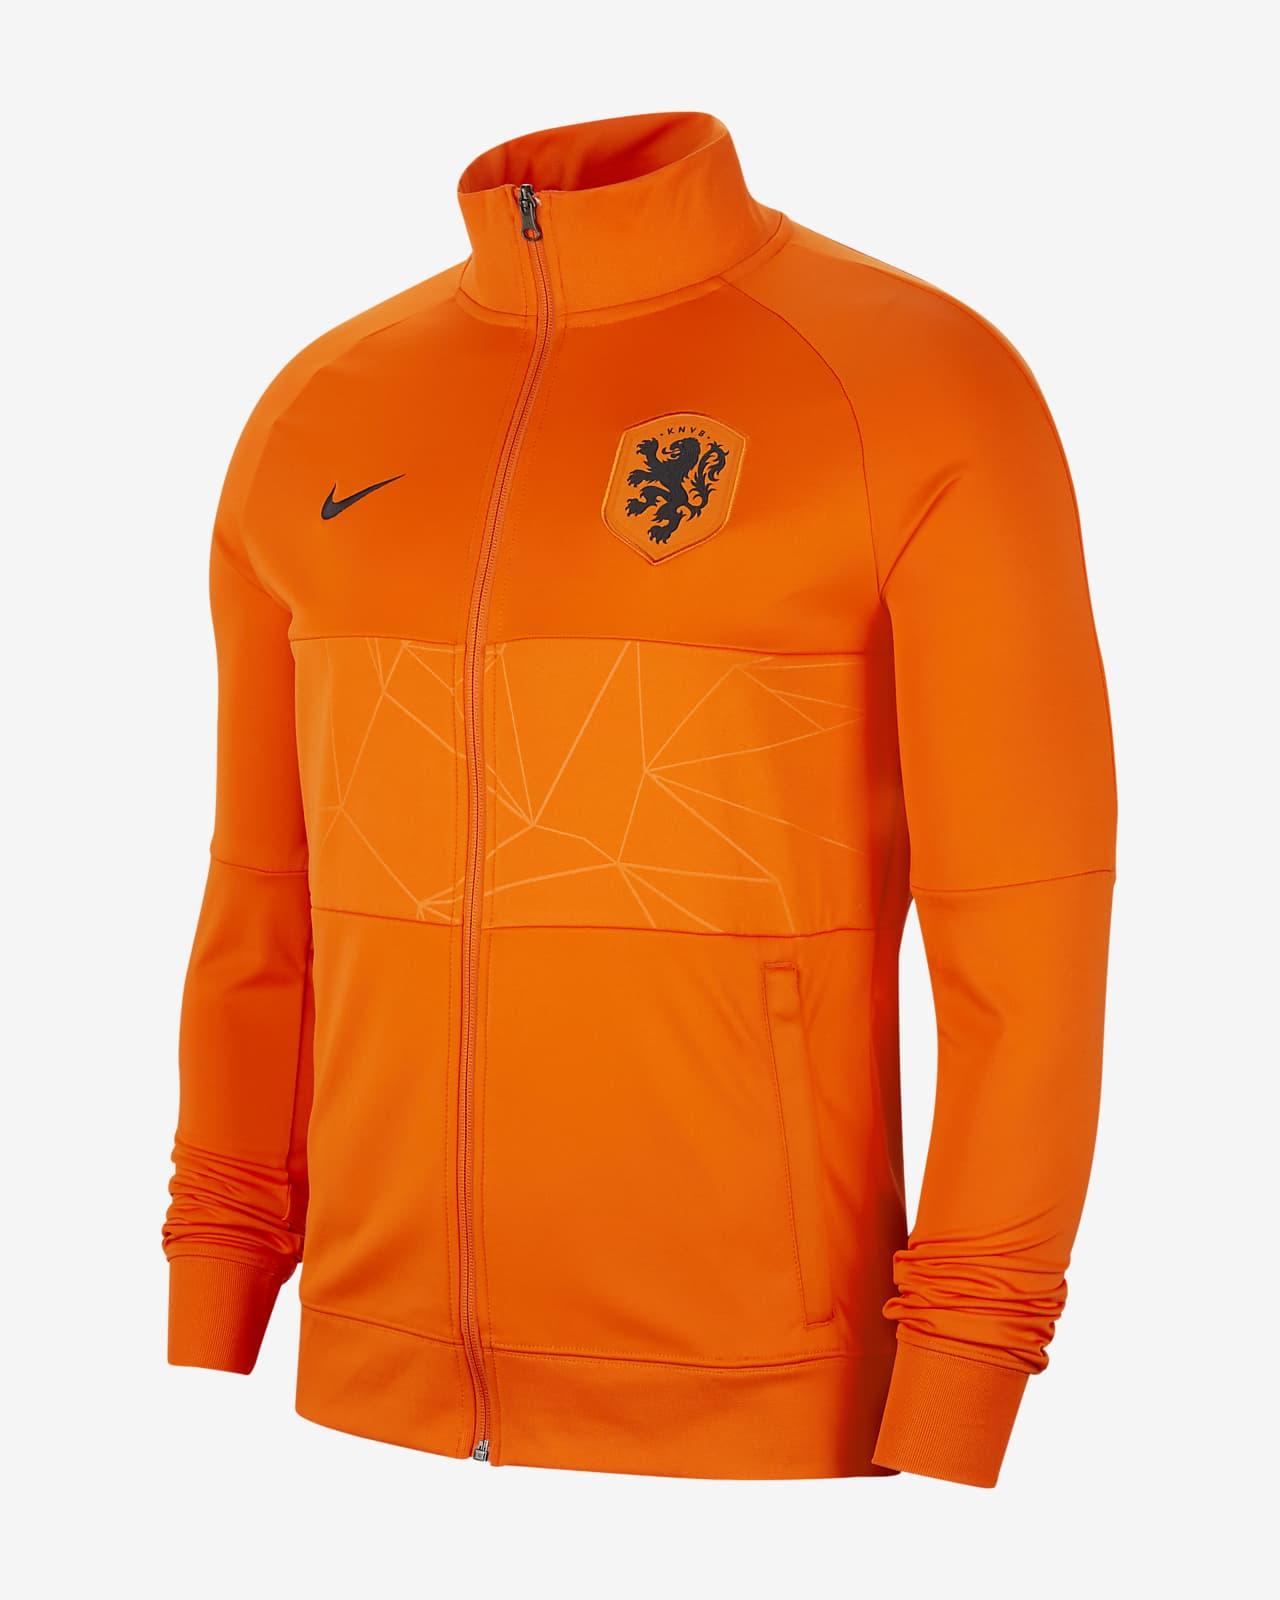 Netherlands Men's Football Jacket